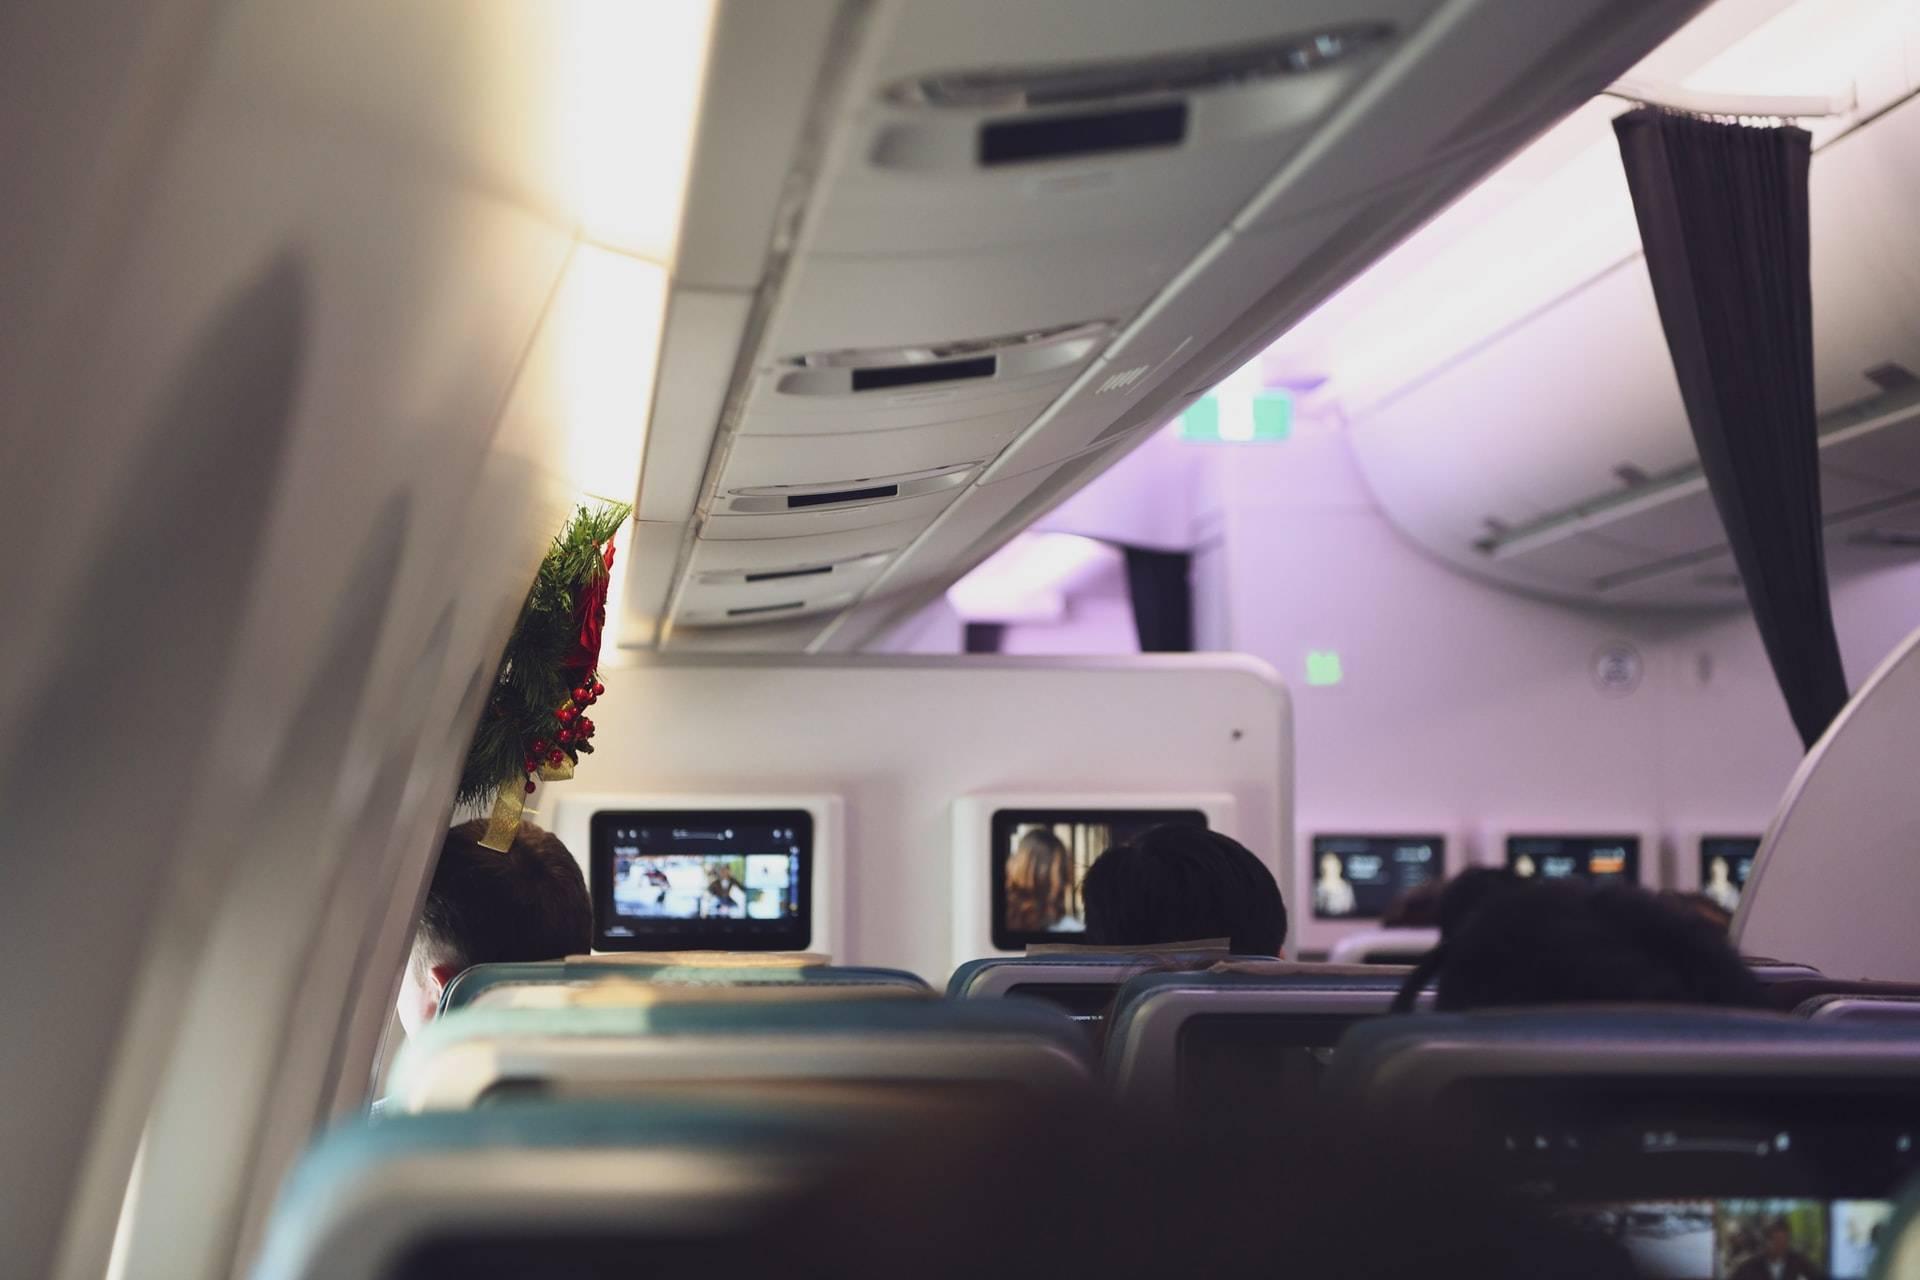 Singapore Australia Air Travel Bubble